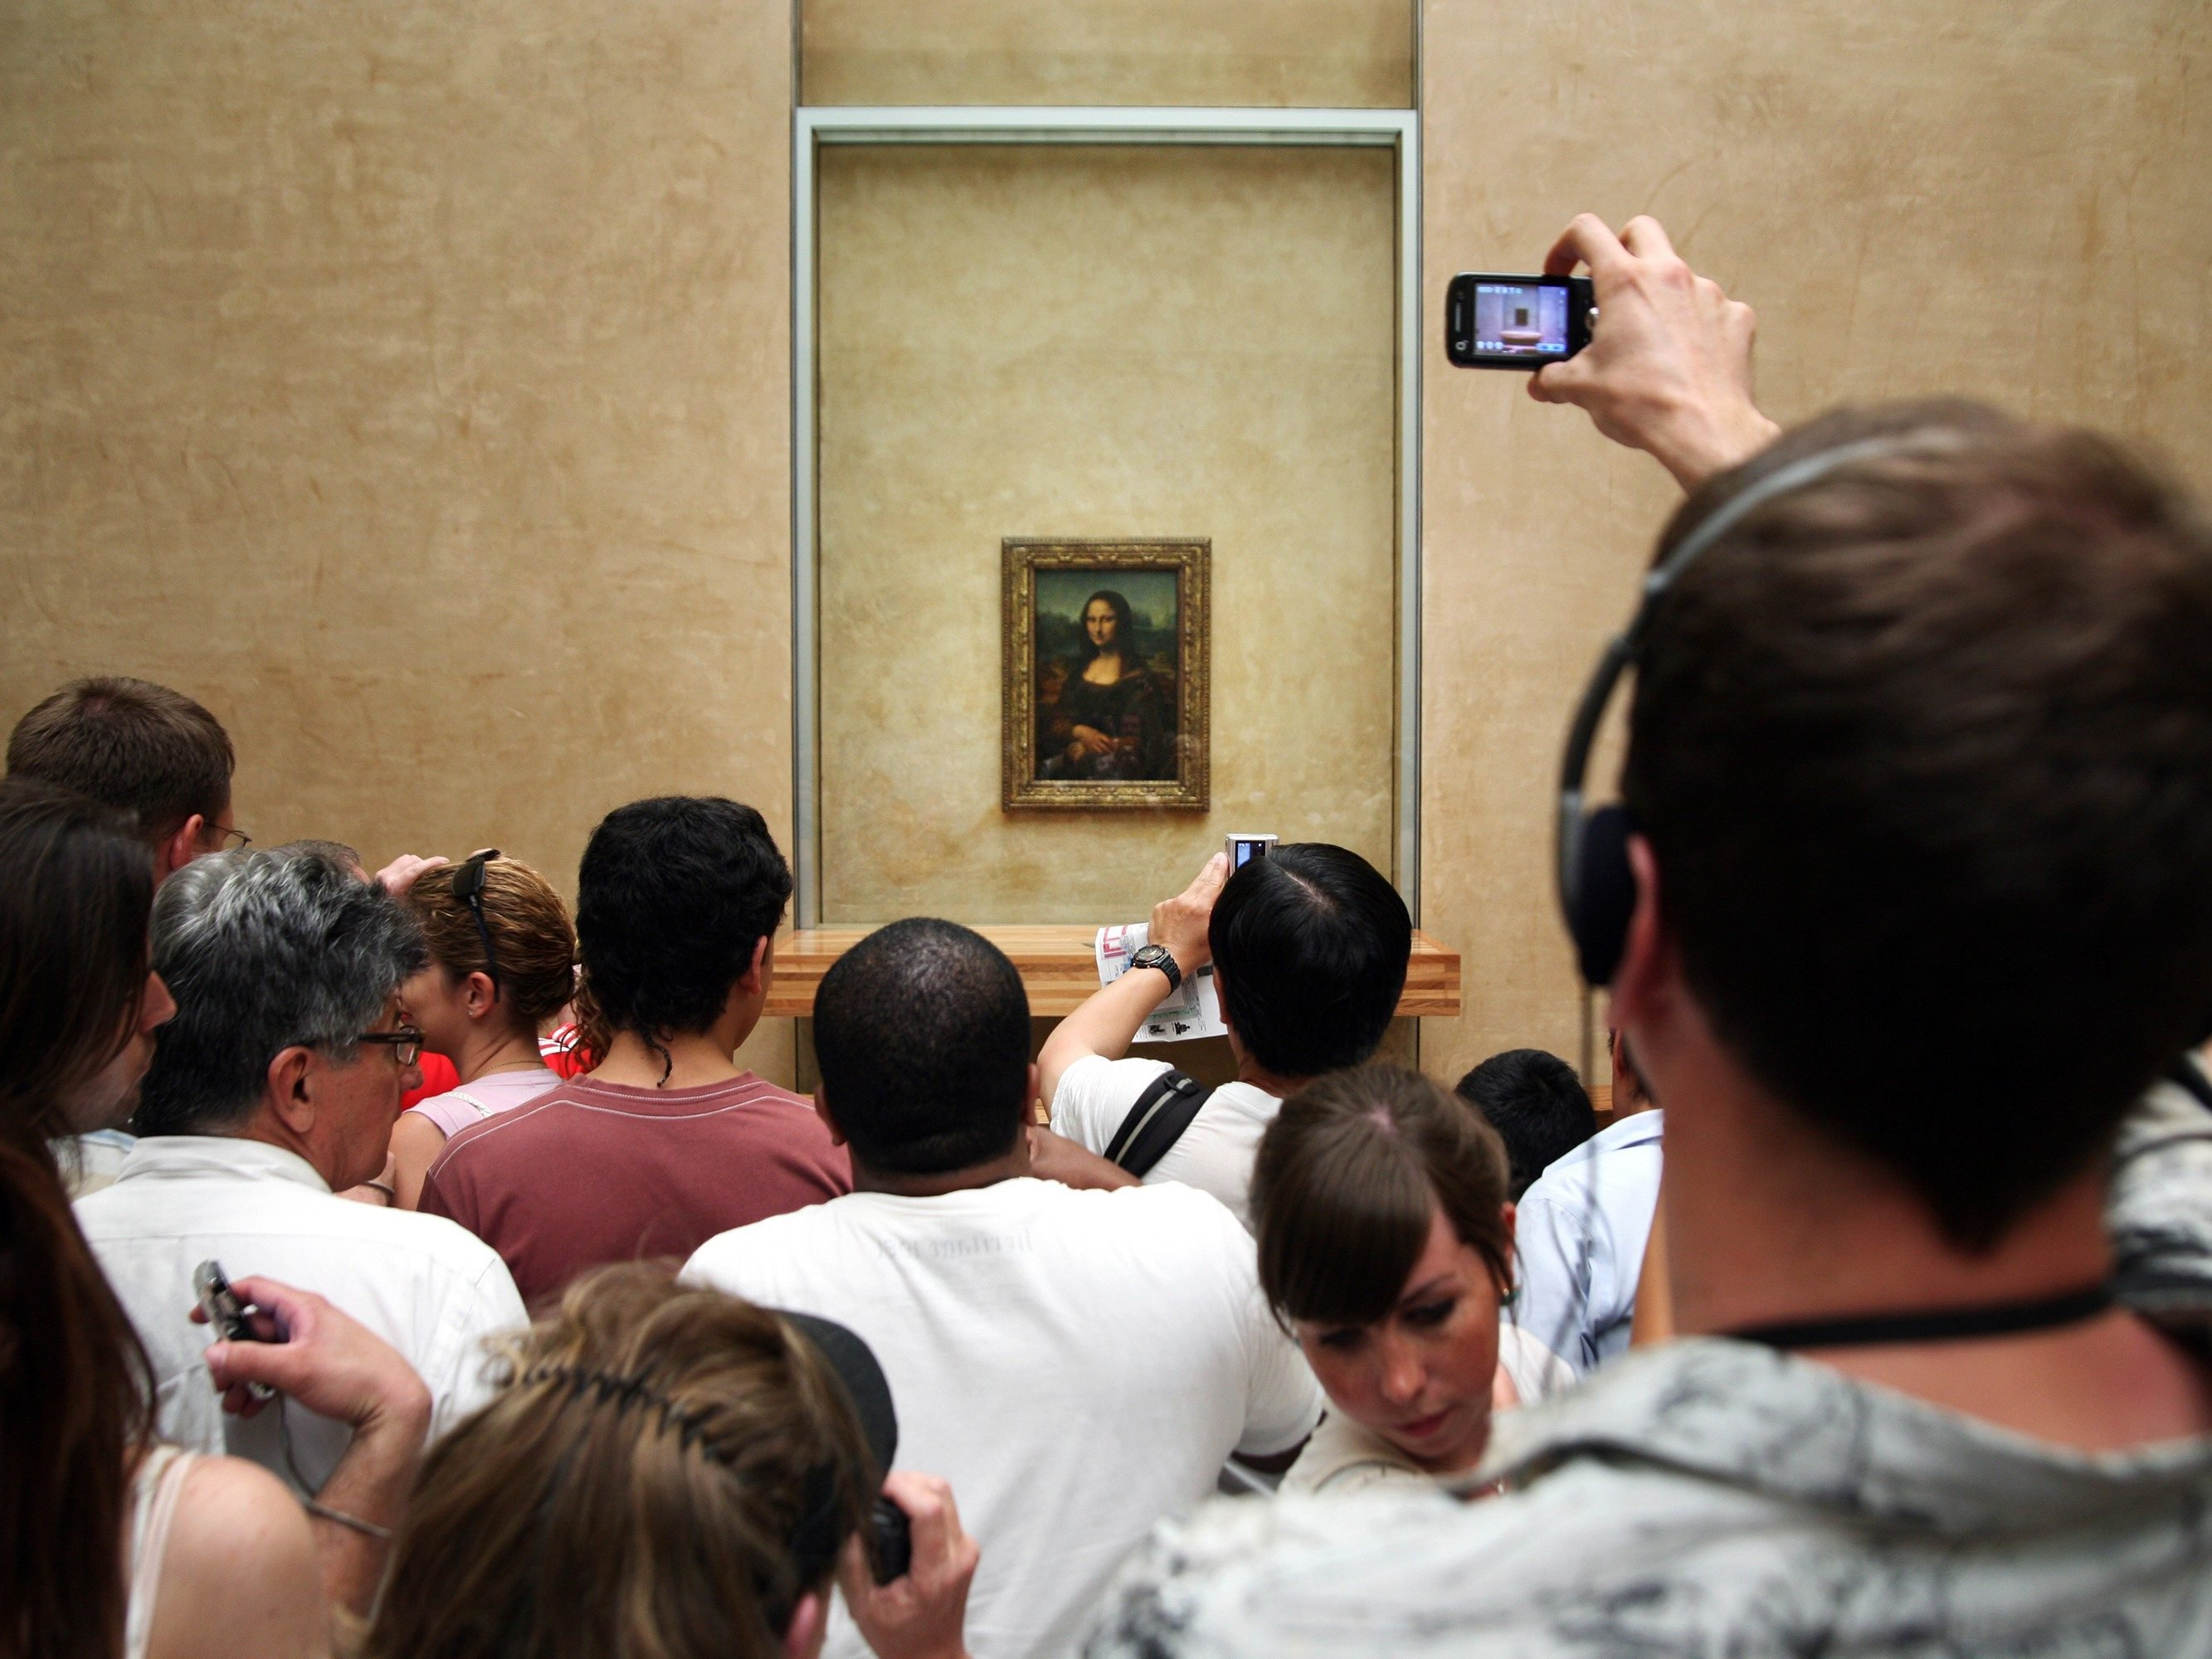 Mona Lisa mystery #1: Who was Mona Lisa?